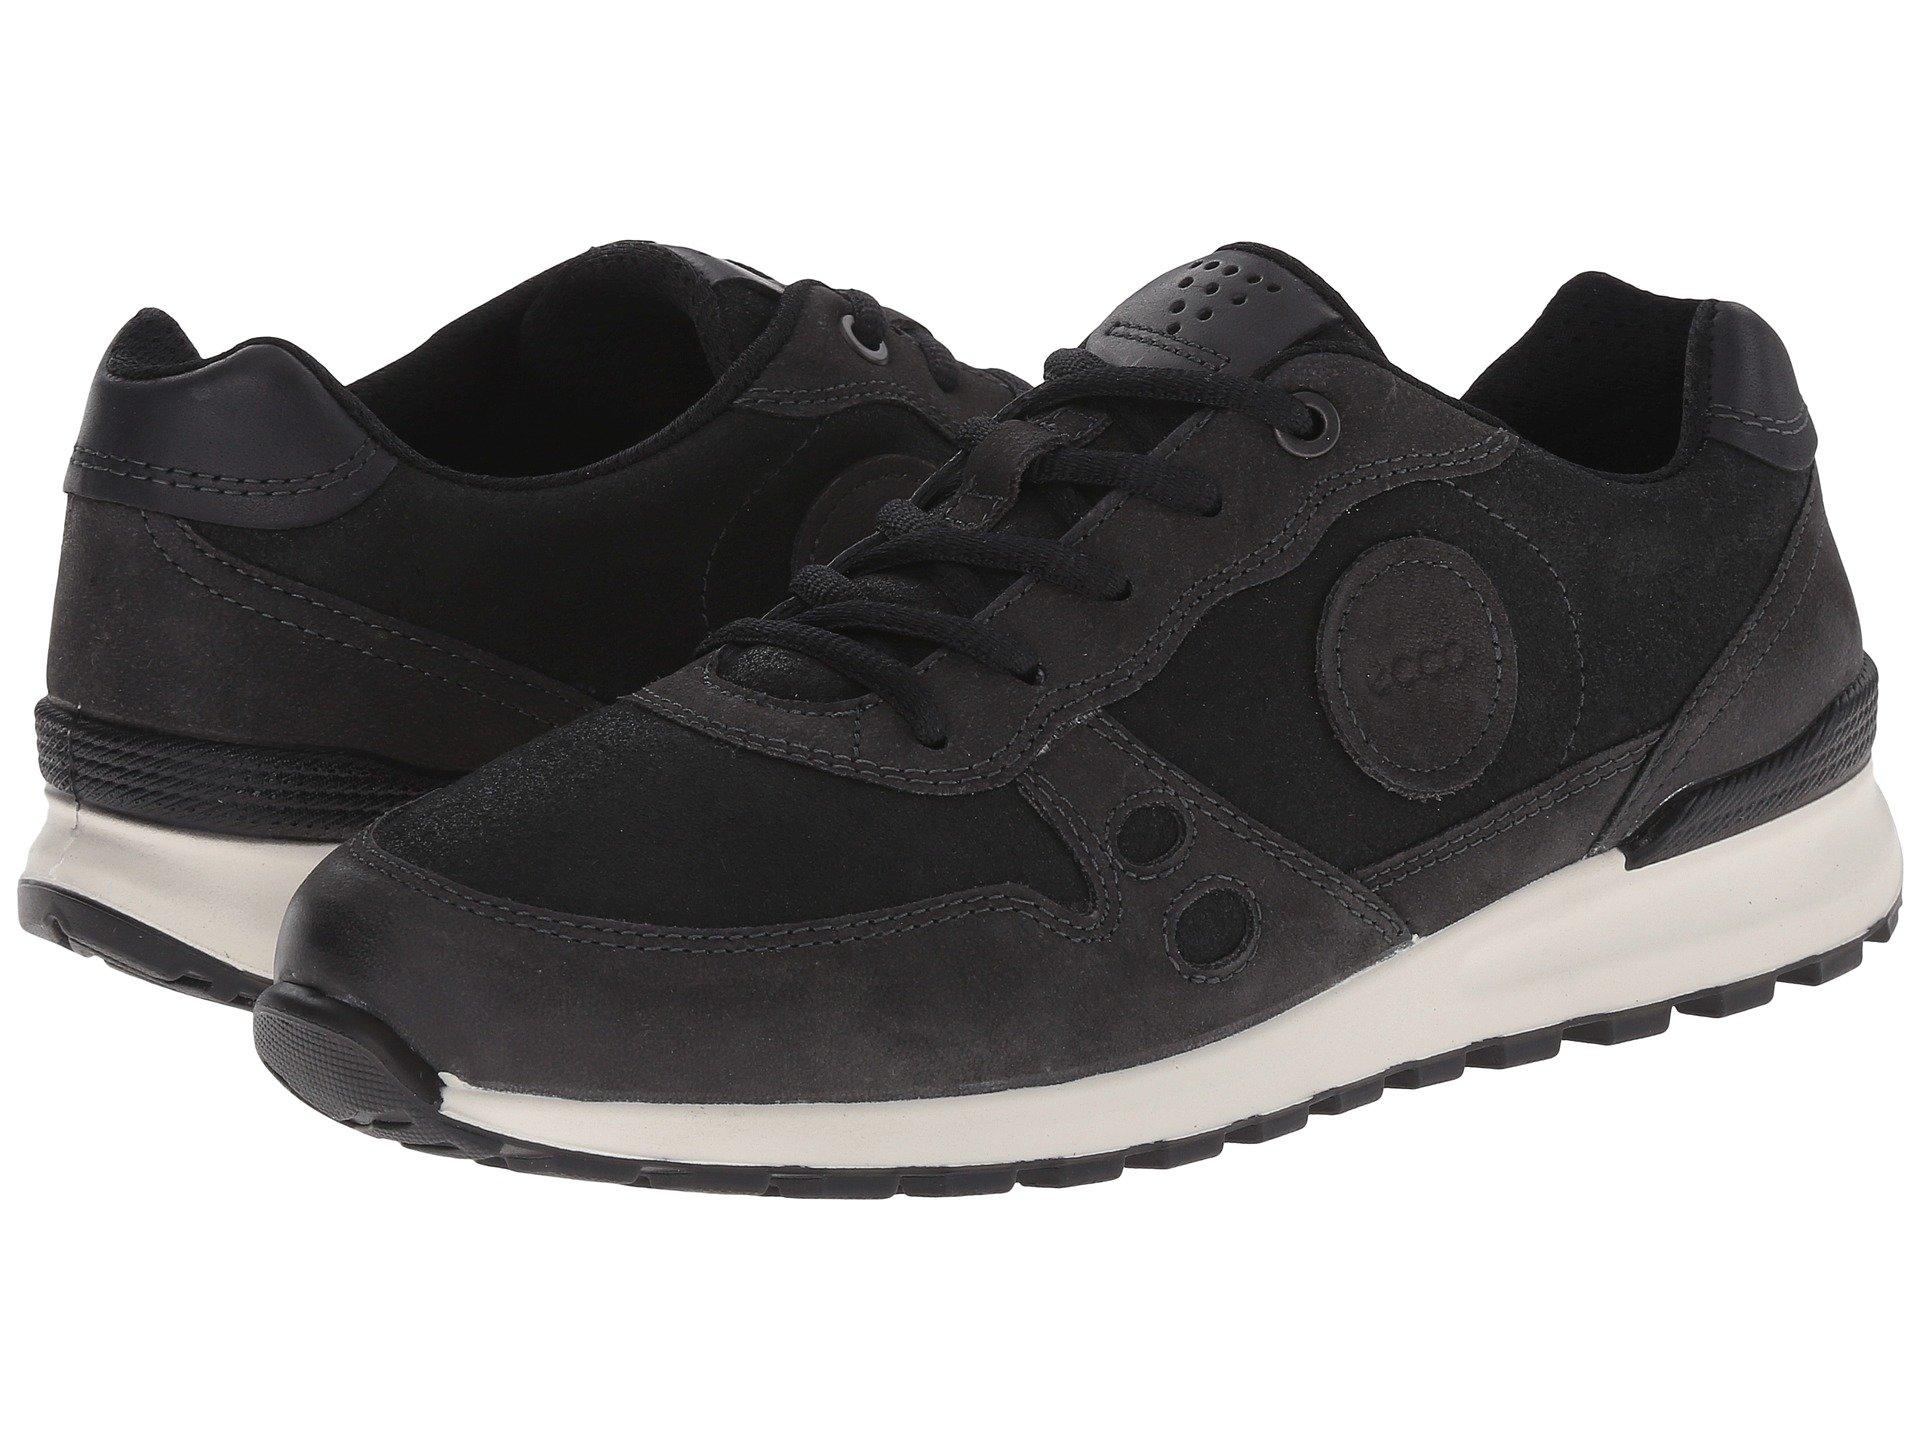 Women's  ECCO CS14 Casual Sneaker for $59.0